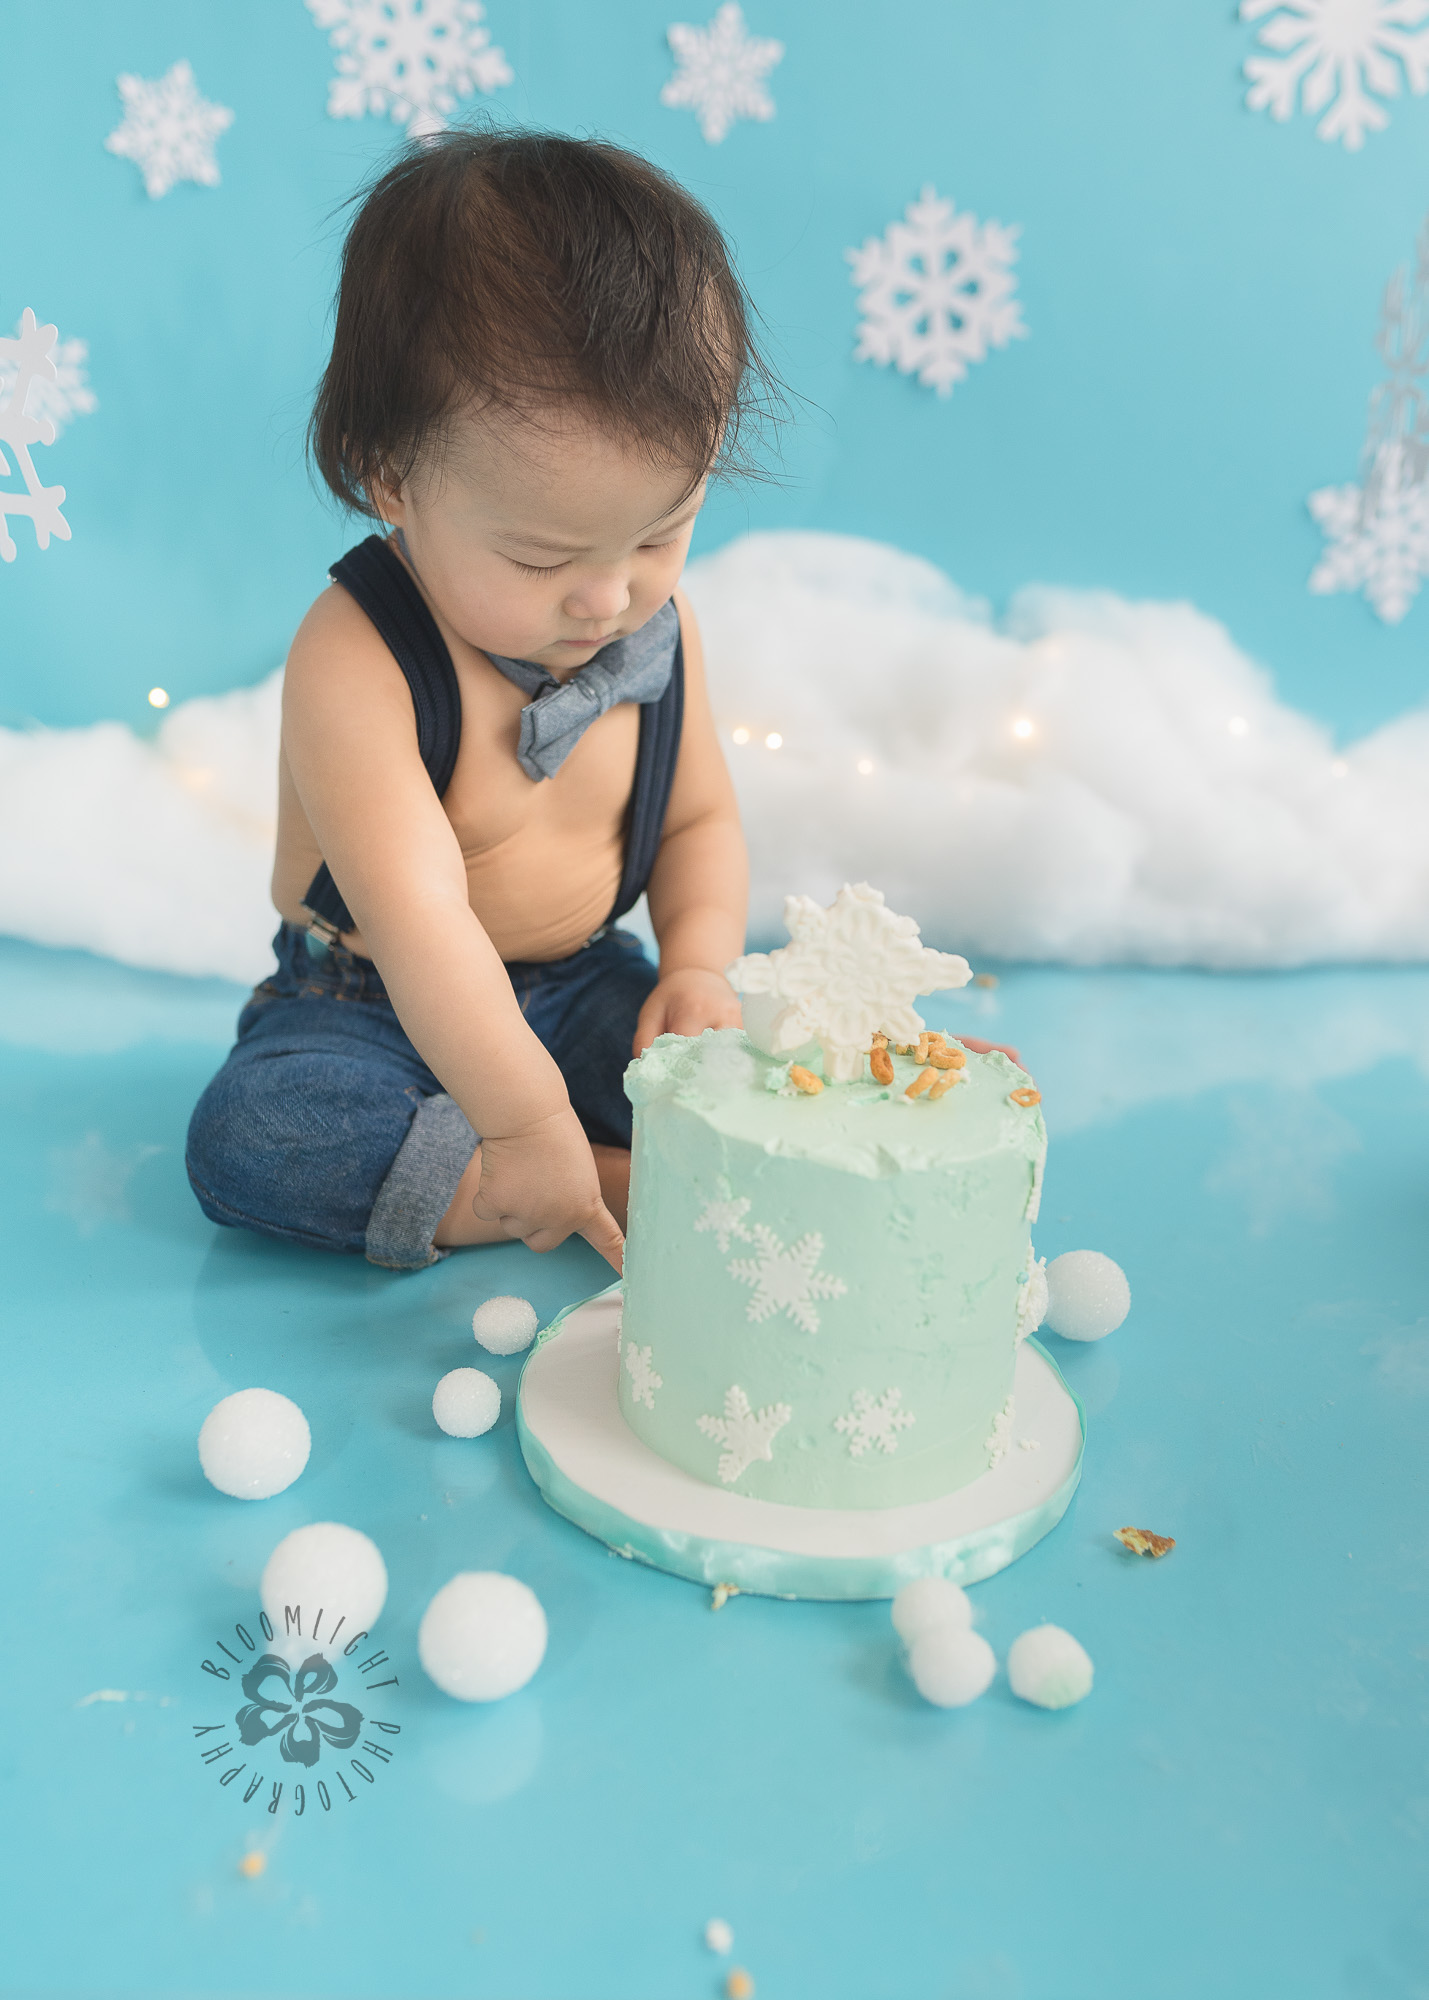 Toronto-North-York-baby-birthday-cake-smash-winter-snowflake-theme-photography (7).jpg